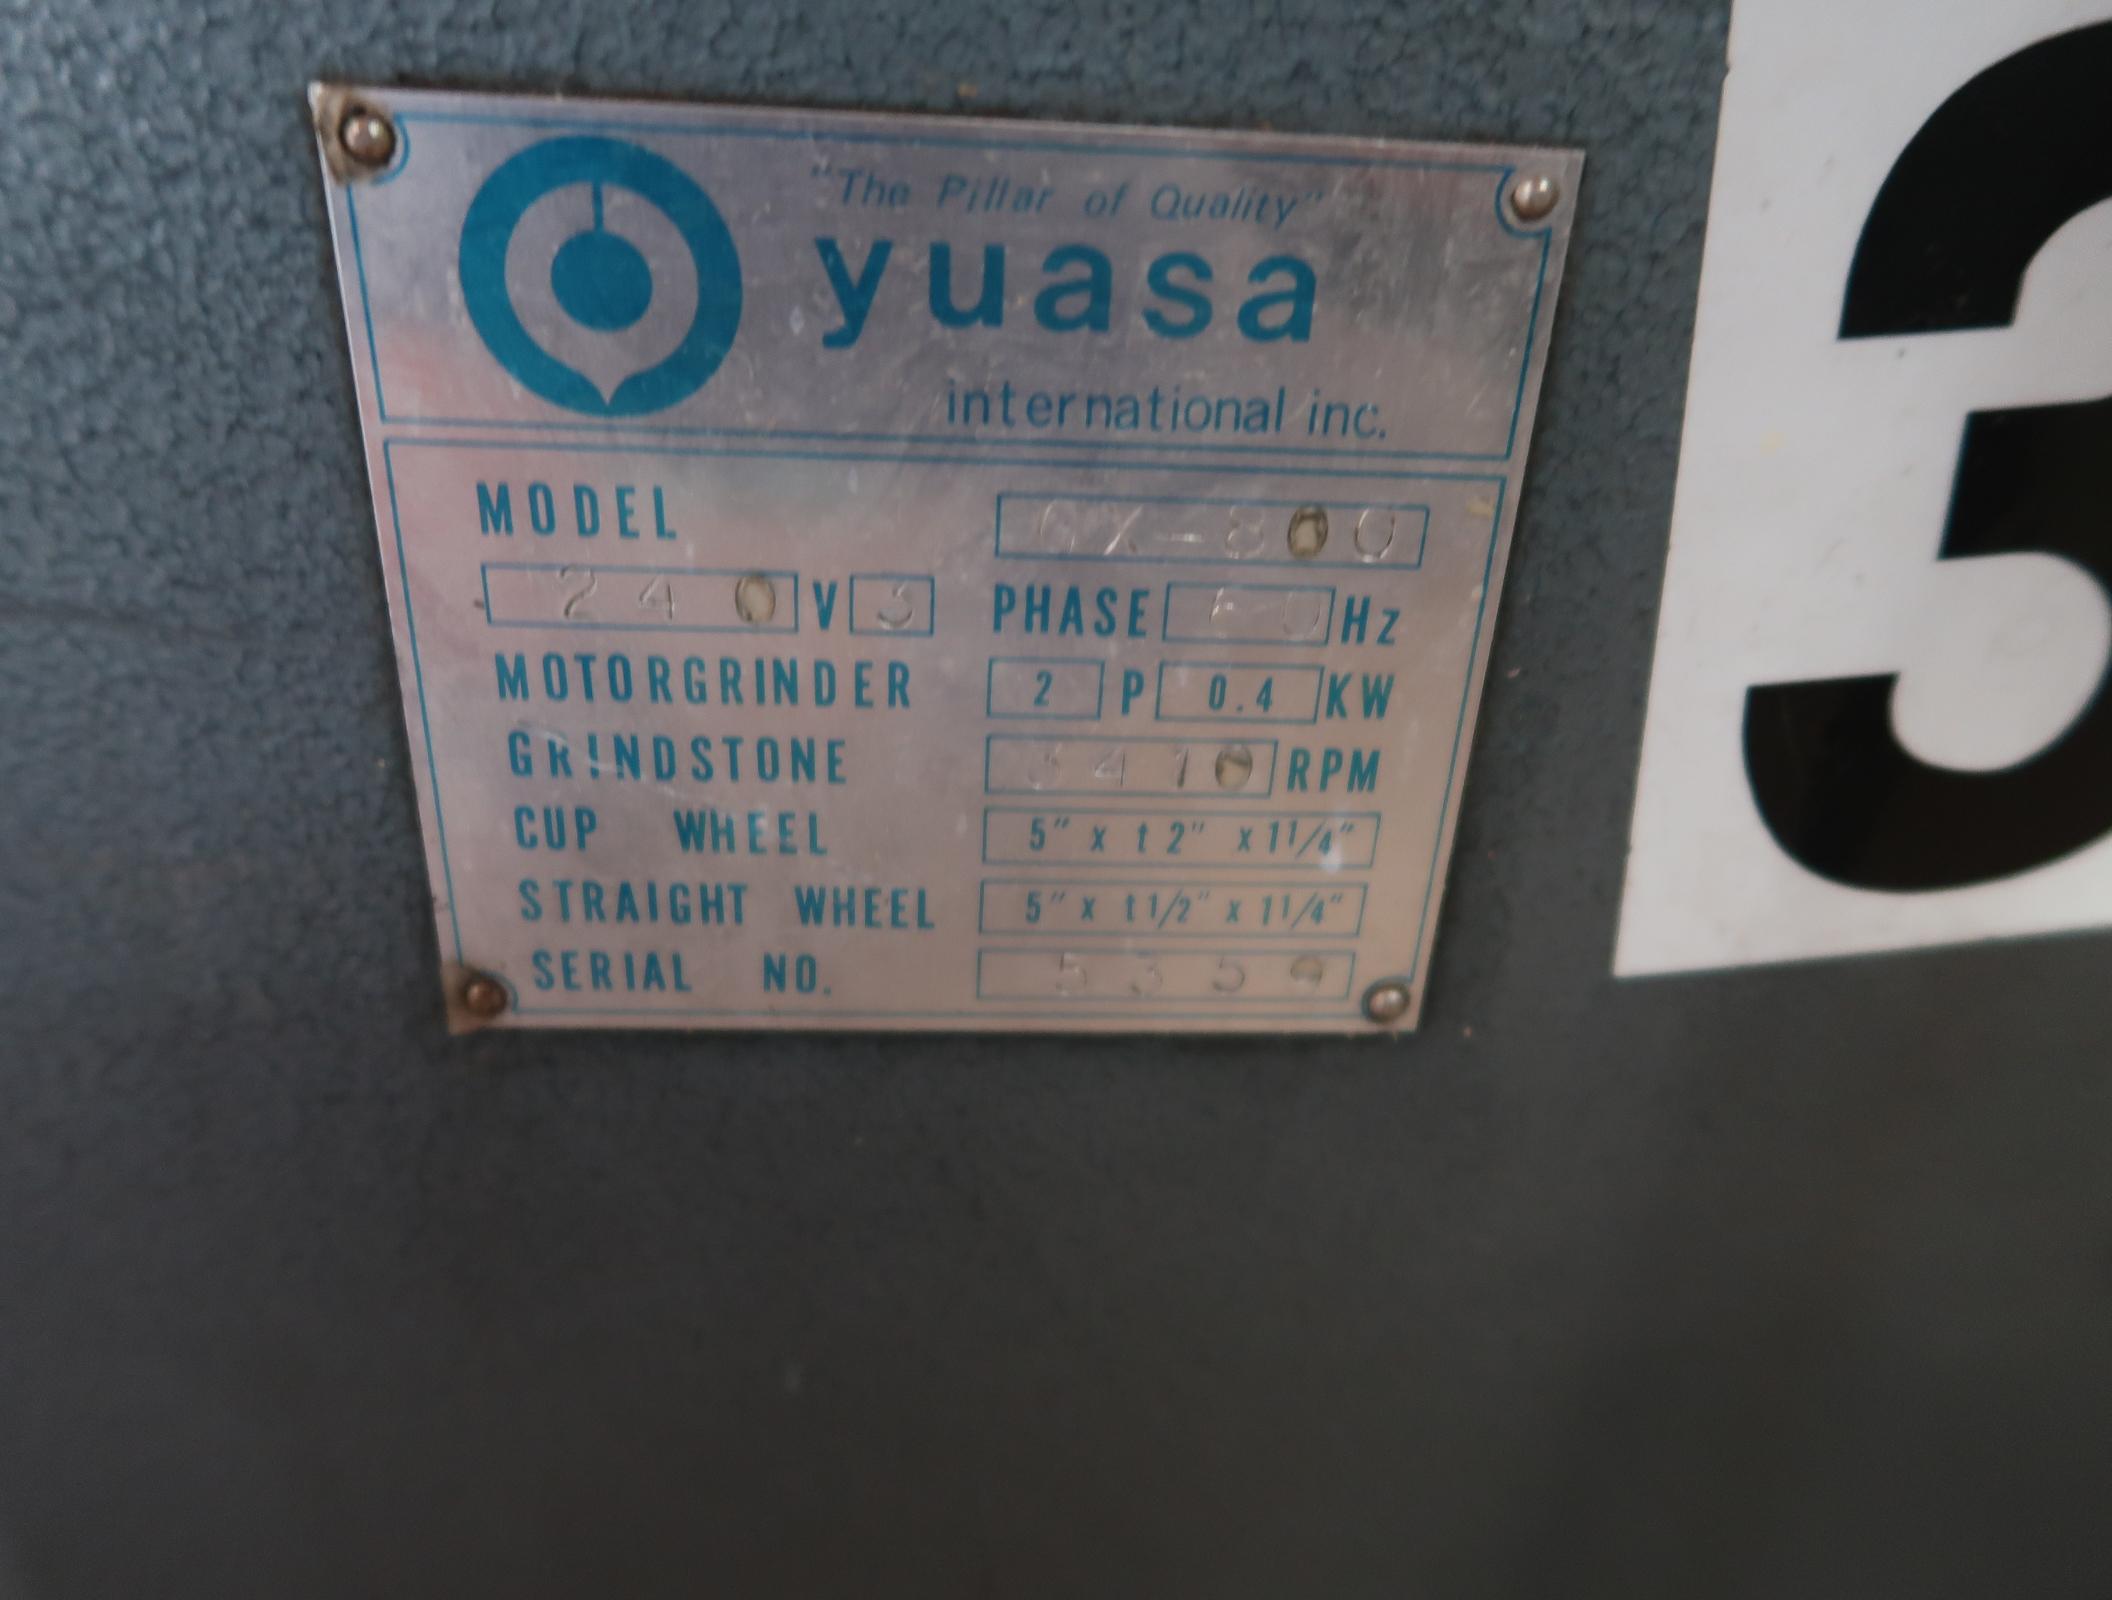 YUASA TOOL ROOM GRINDER MDL GX-800 SN. 5359 - Image 2 of 4